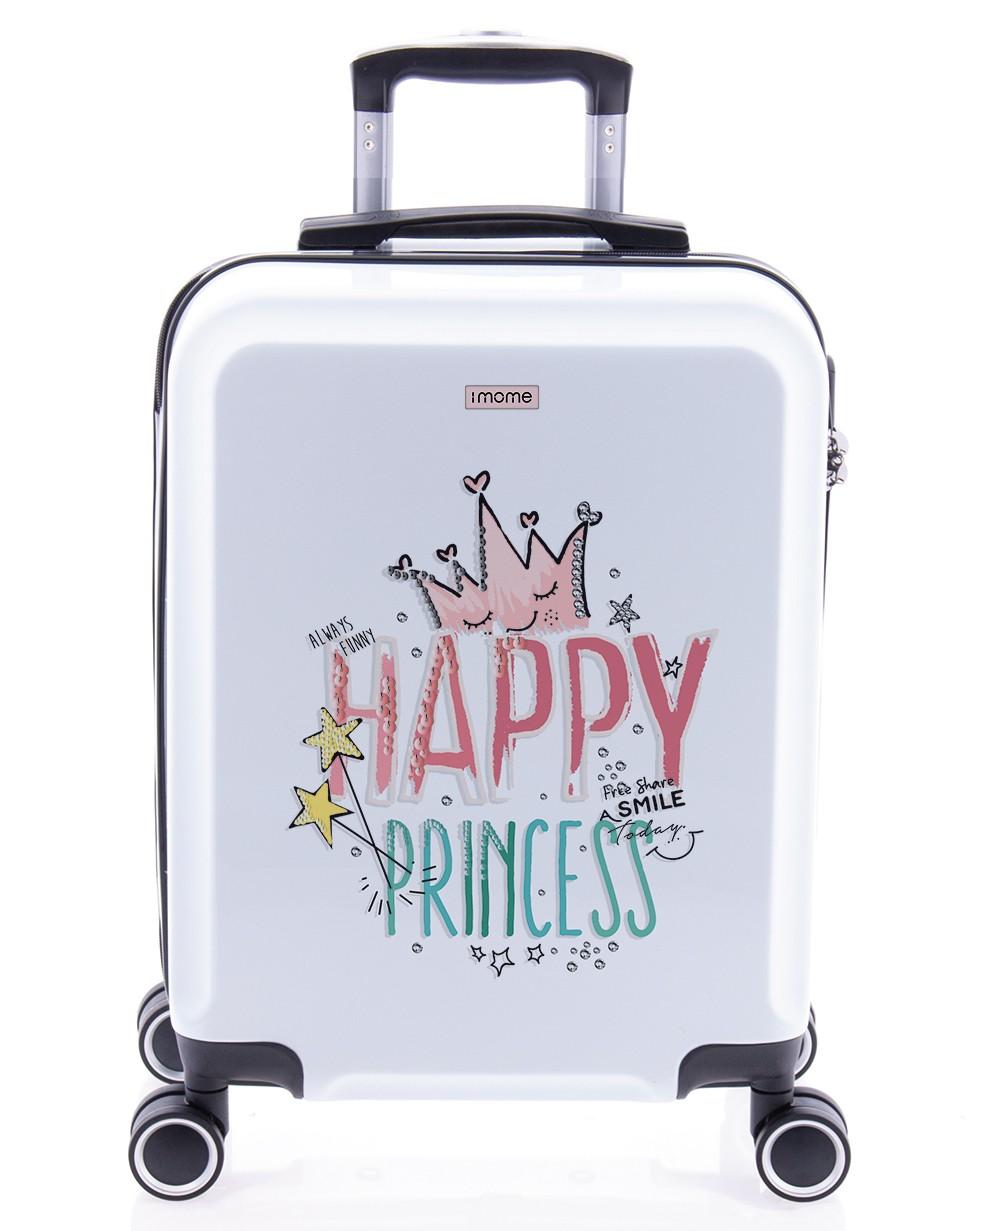 imome Cool Maleta de mano Happy Princess Princesa (Foto )